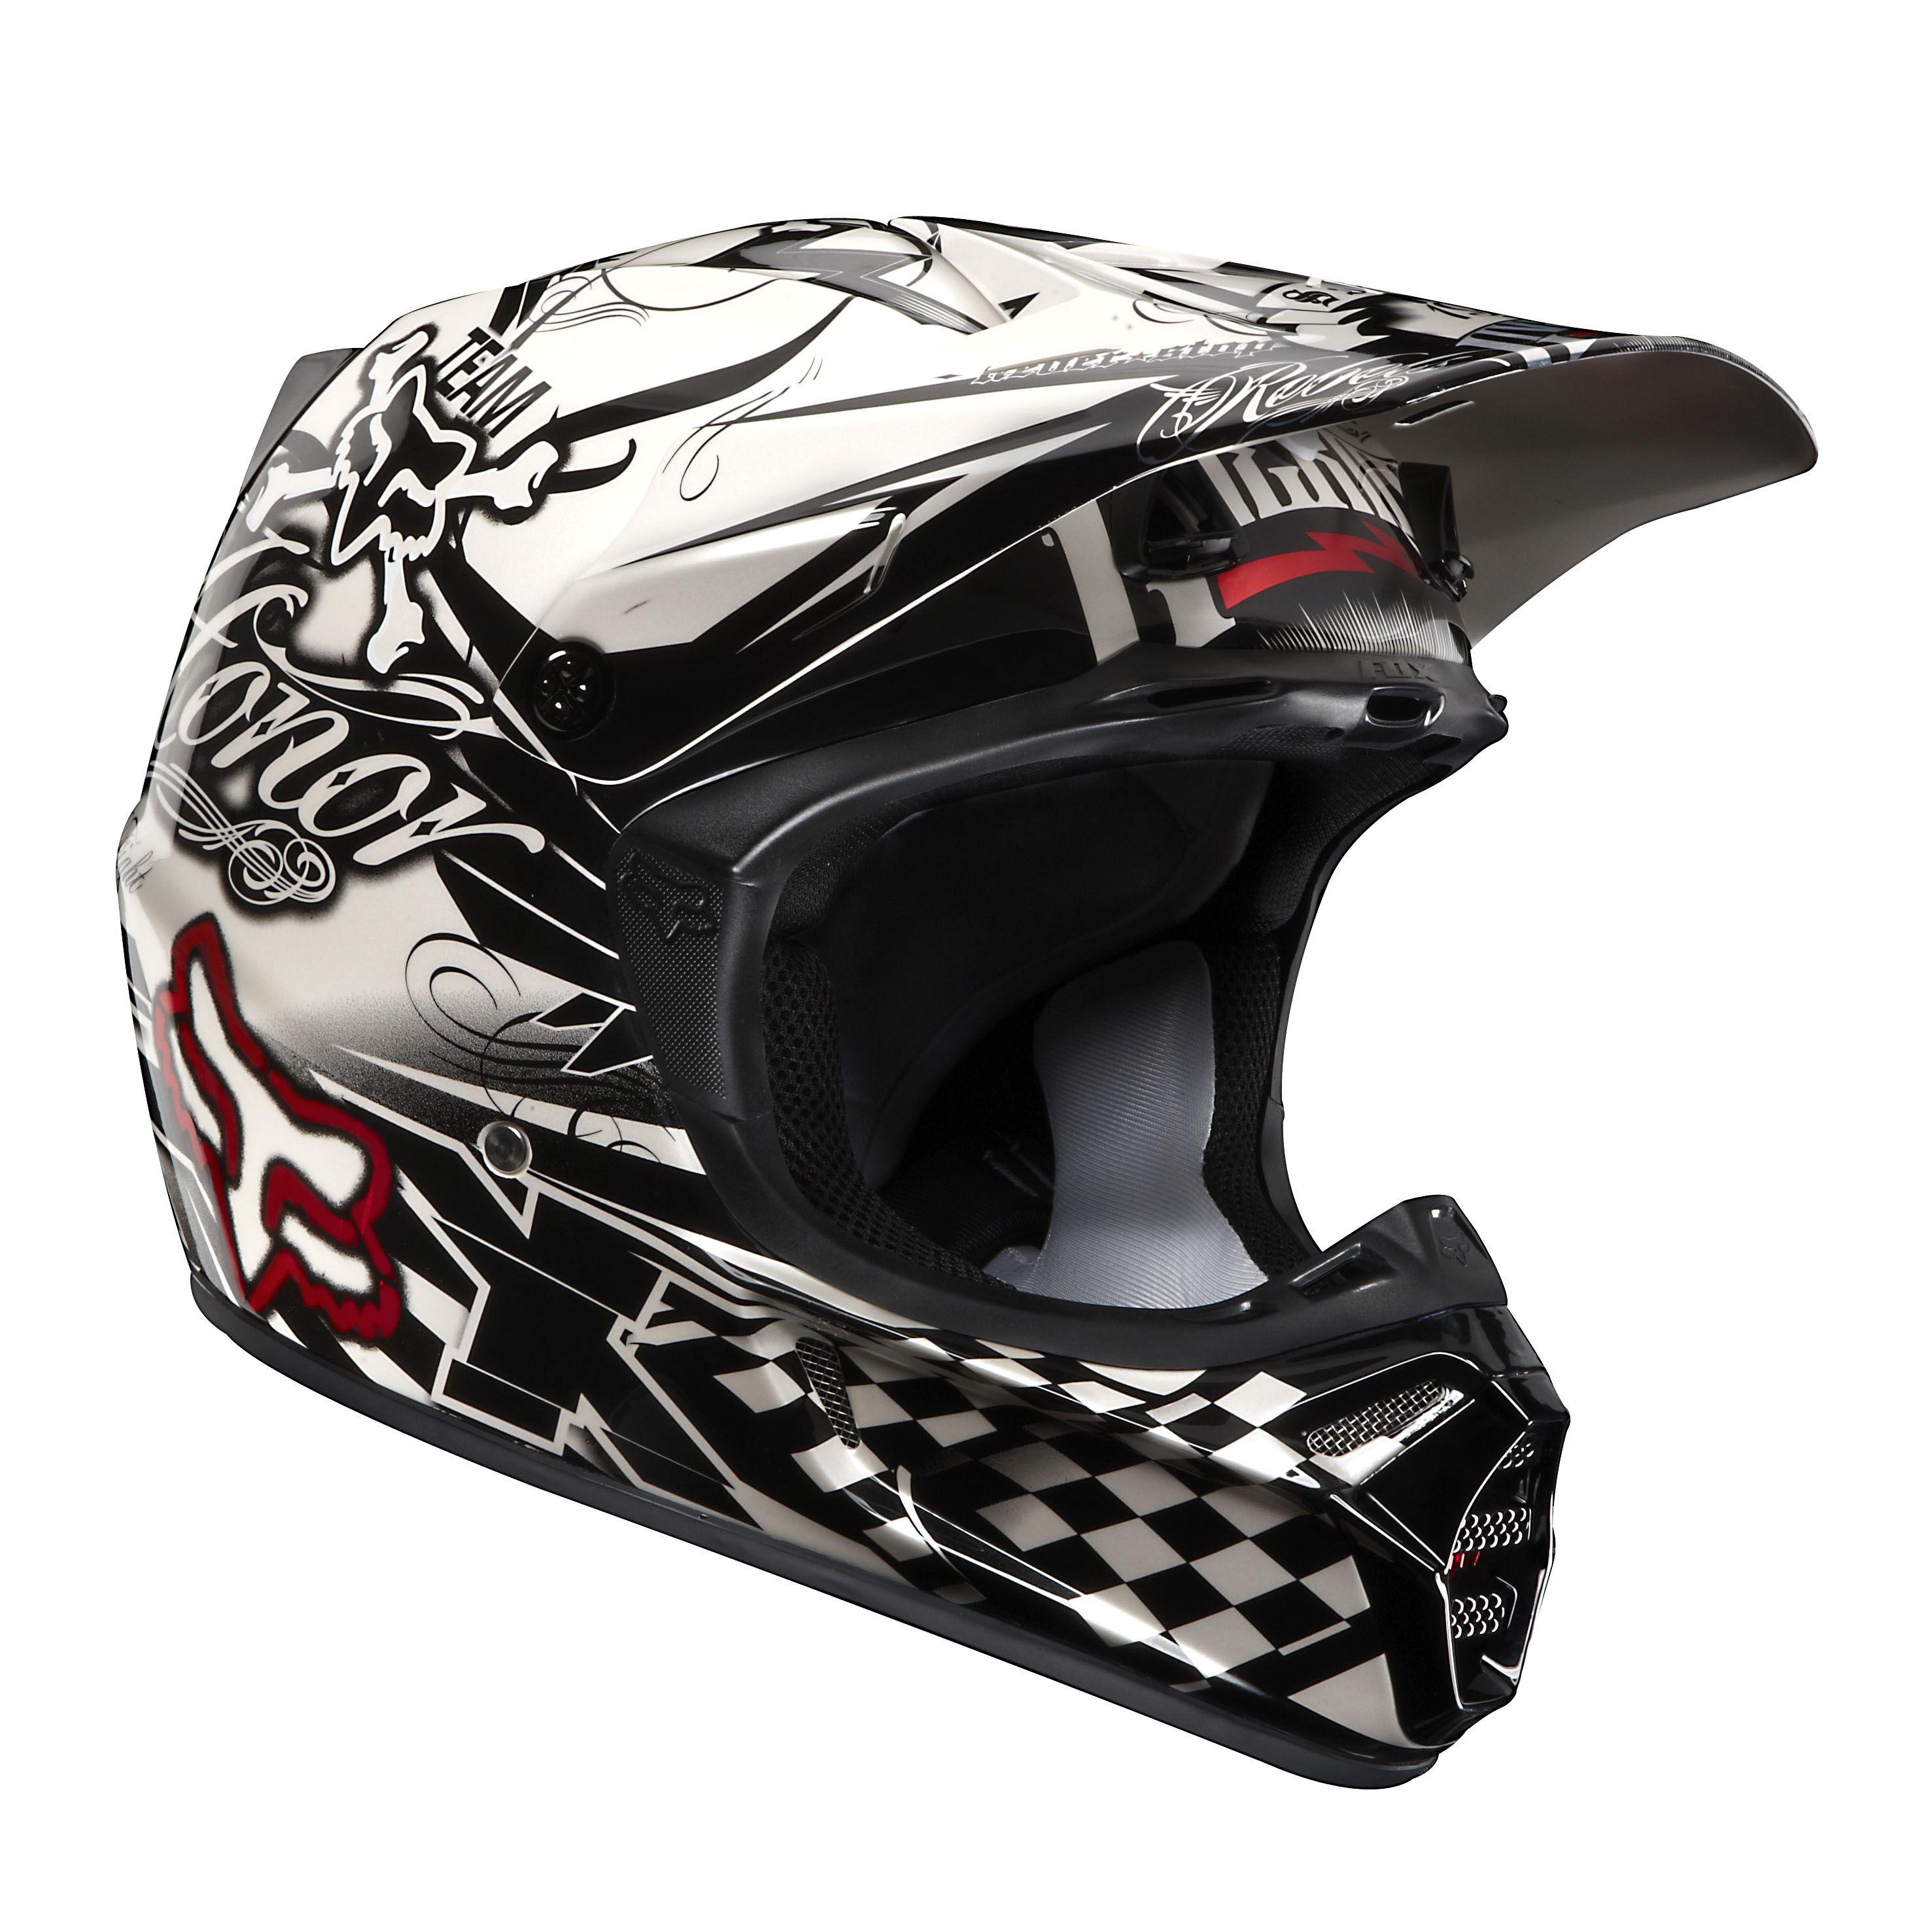 Helmets Teebeemotorcycles Category Fox Motocross Helmets